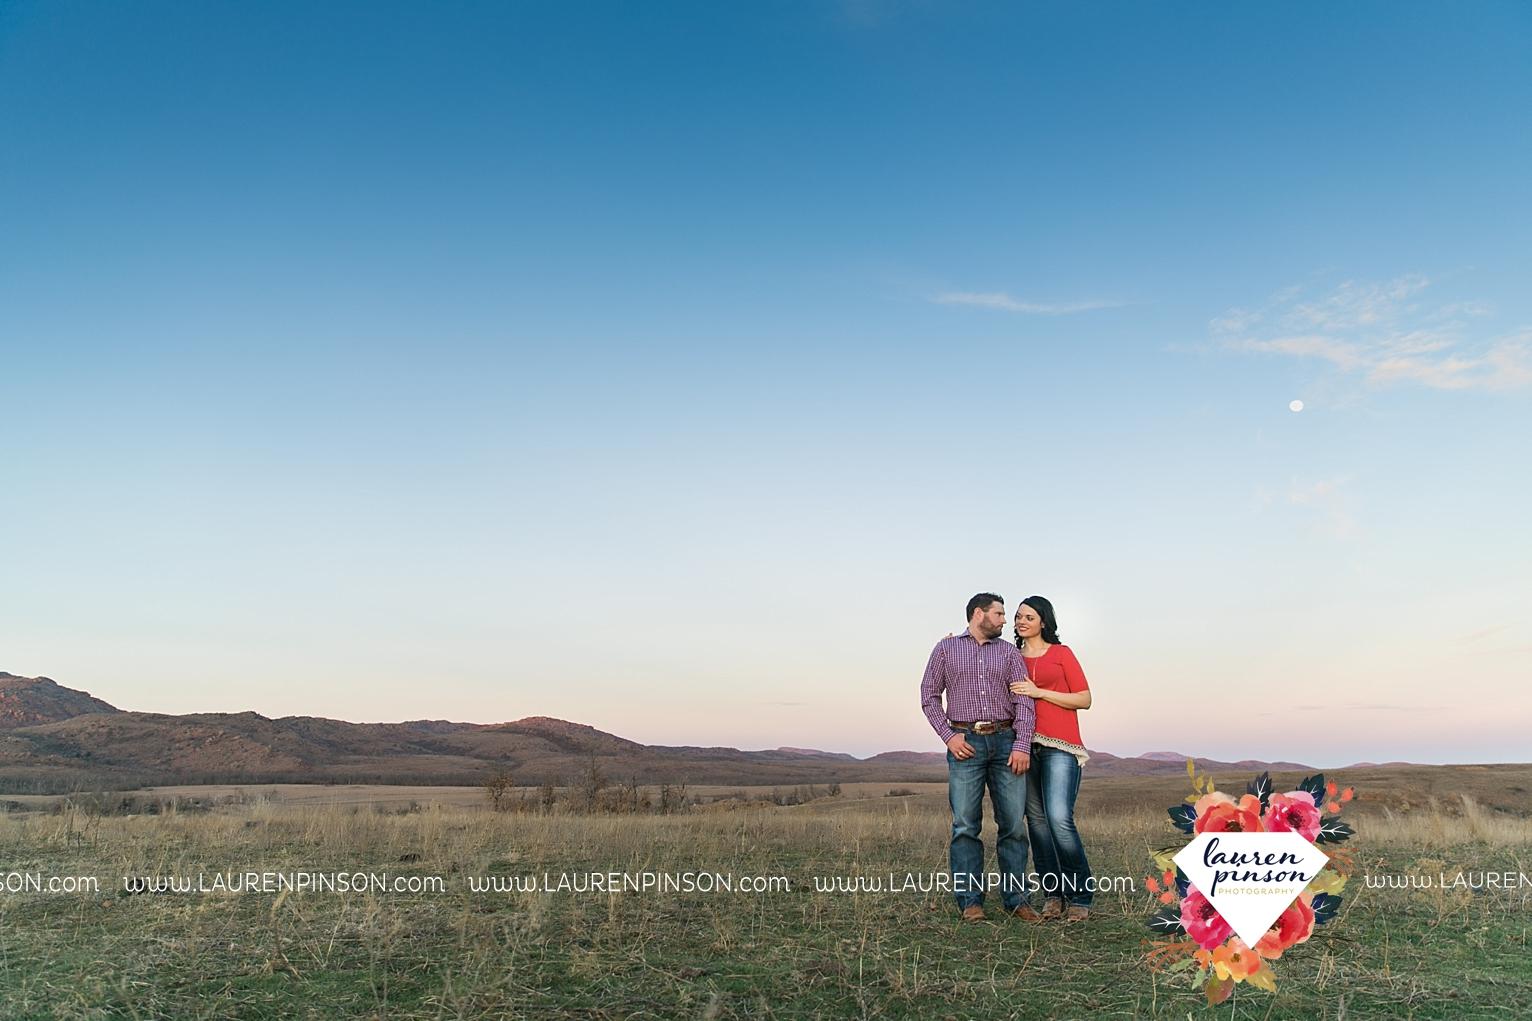 wichita-falls-texas-engagement-photographer-wedding-oklahoma-lawton-wichita-mountains-refuge-outdoors-mountains-engaged_2070.jpg